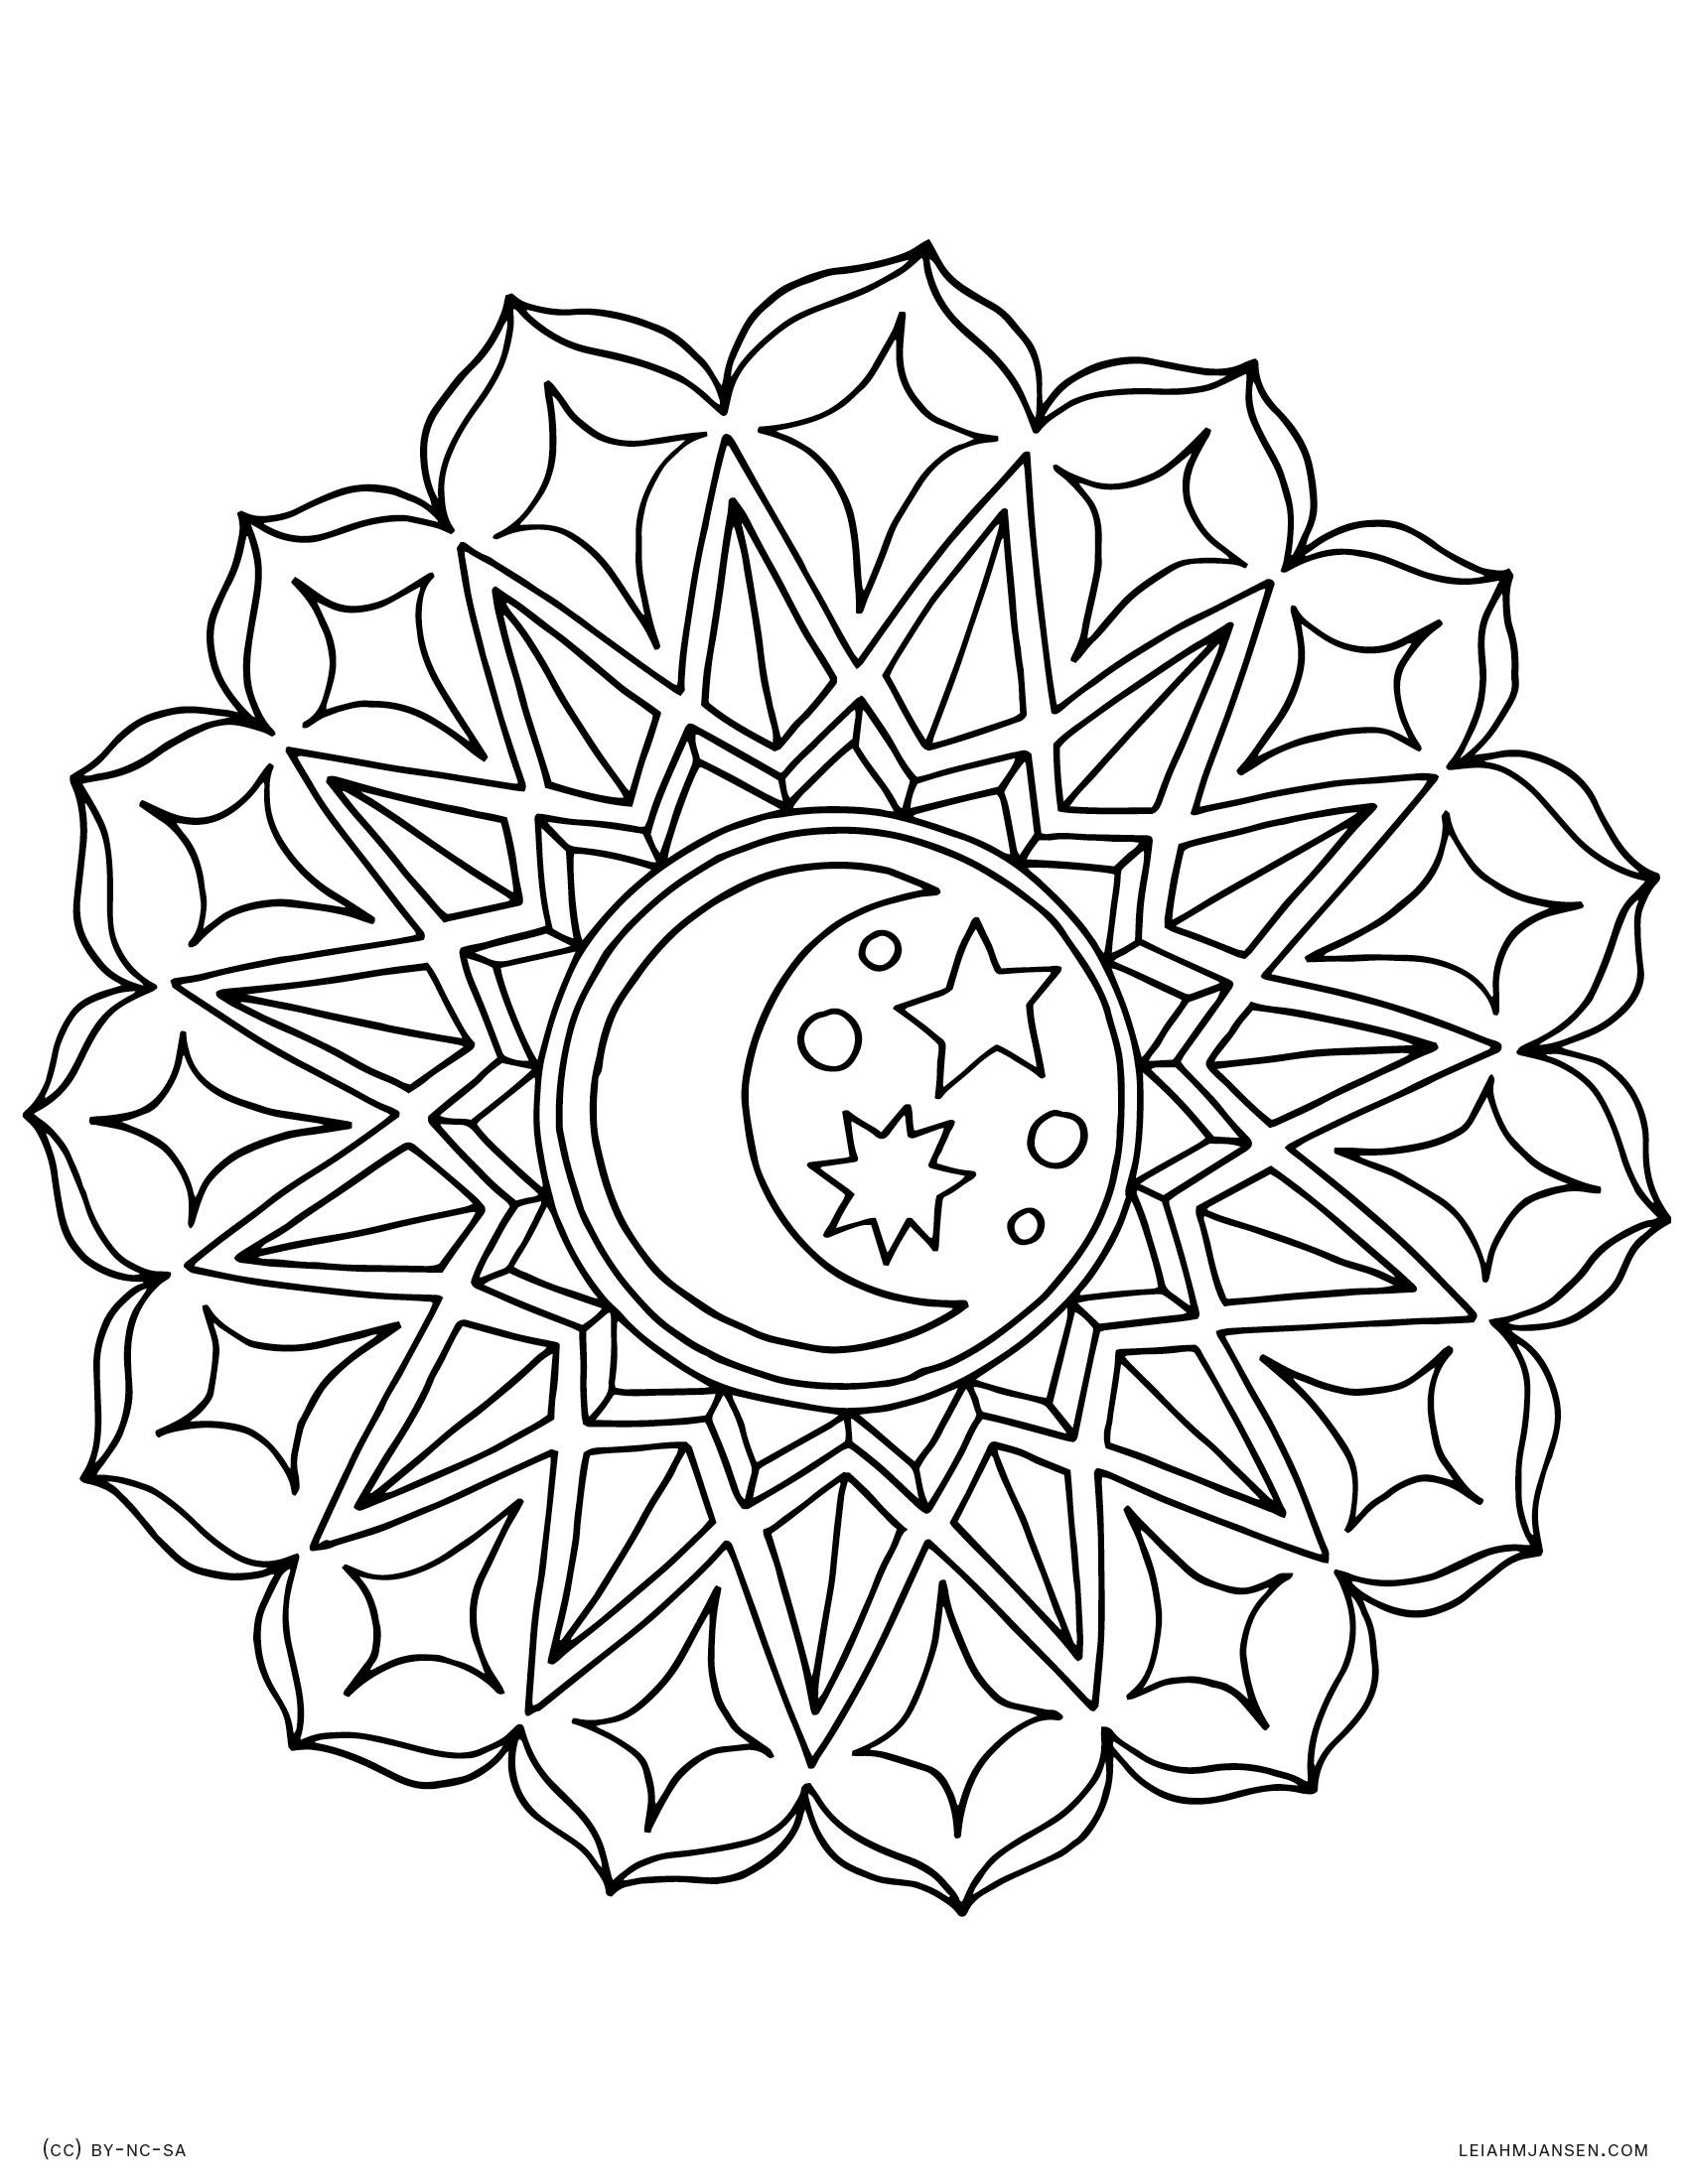 Coloring Pages - Mandala Coloring Free Printable